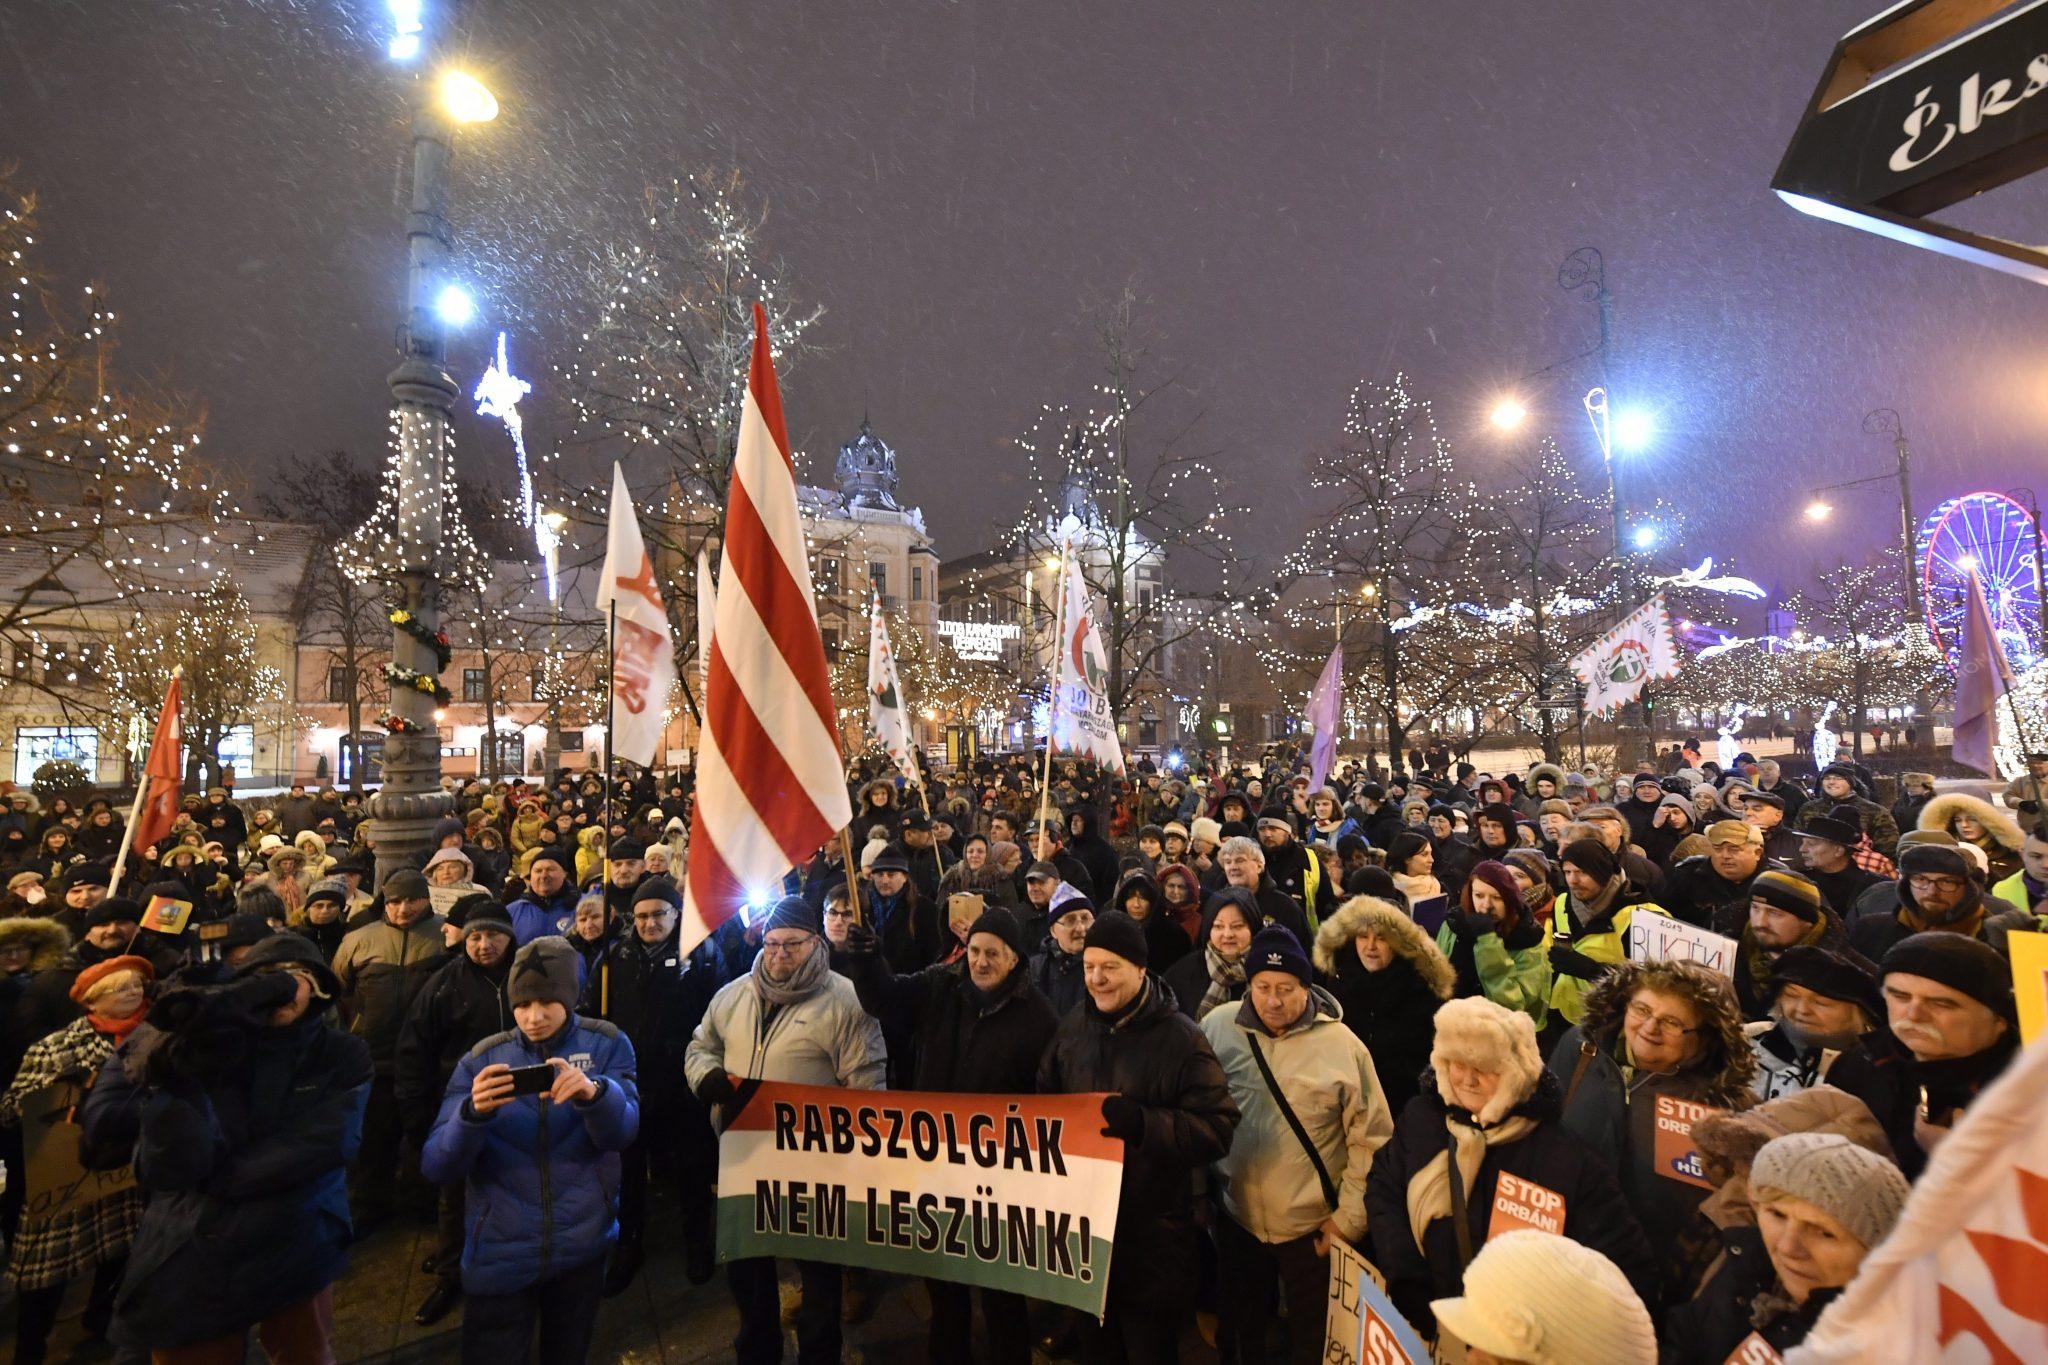 Debrecen demonstration